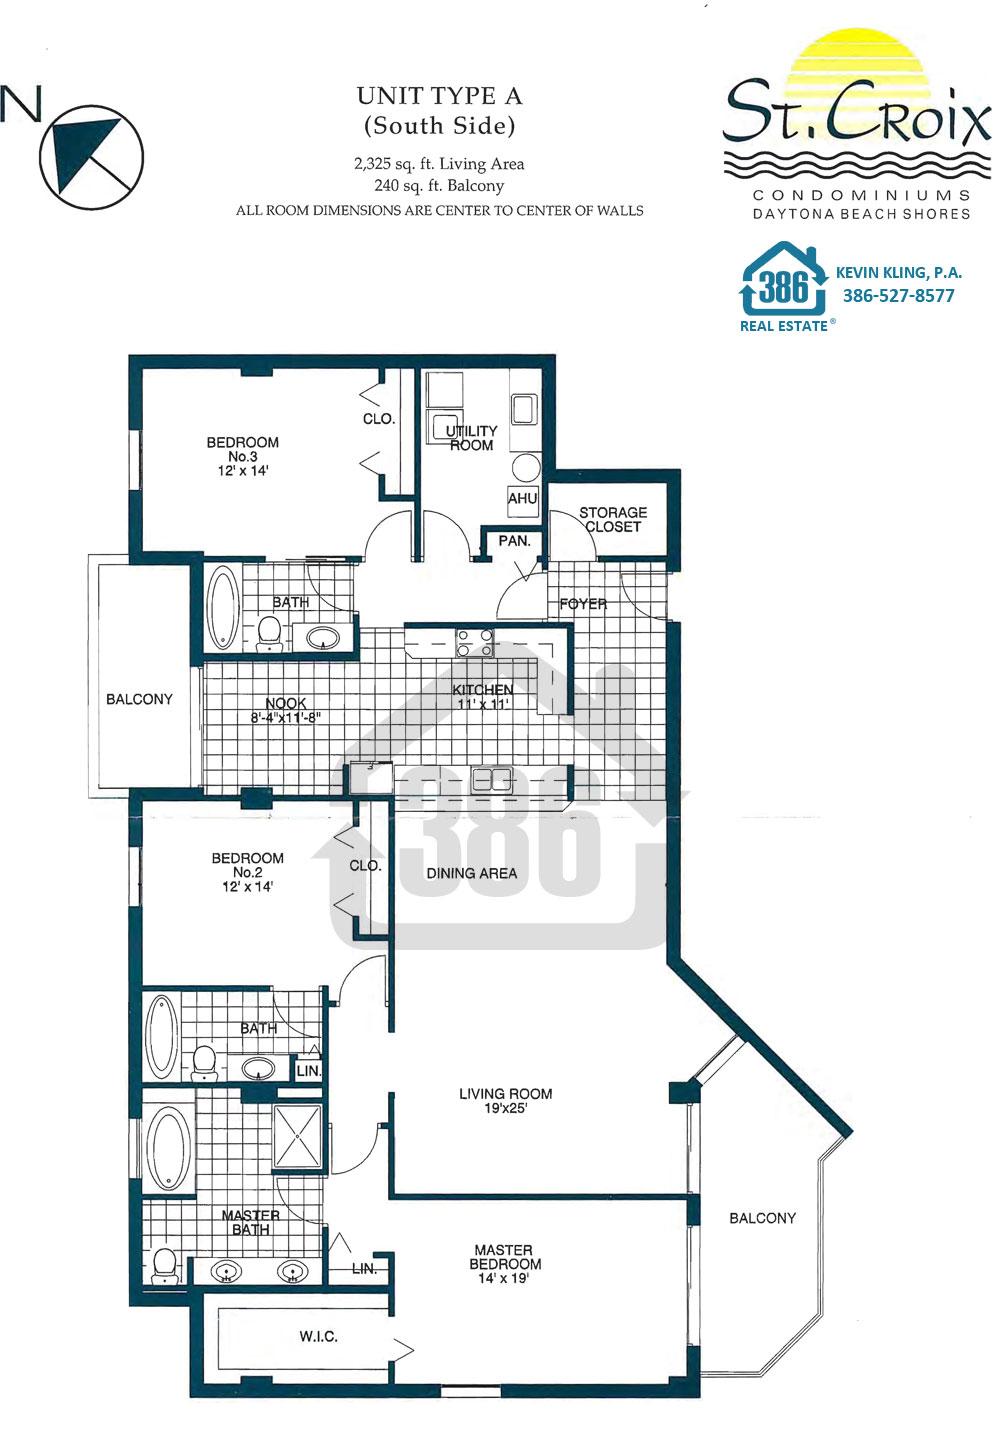 St. Croix 05 Plan